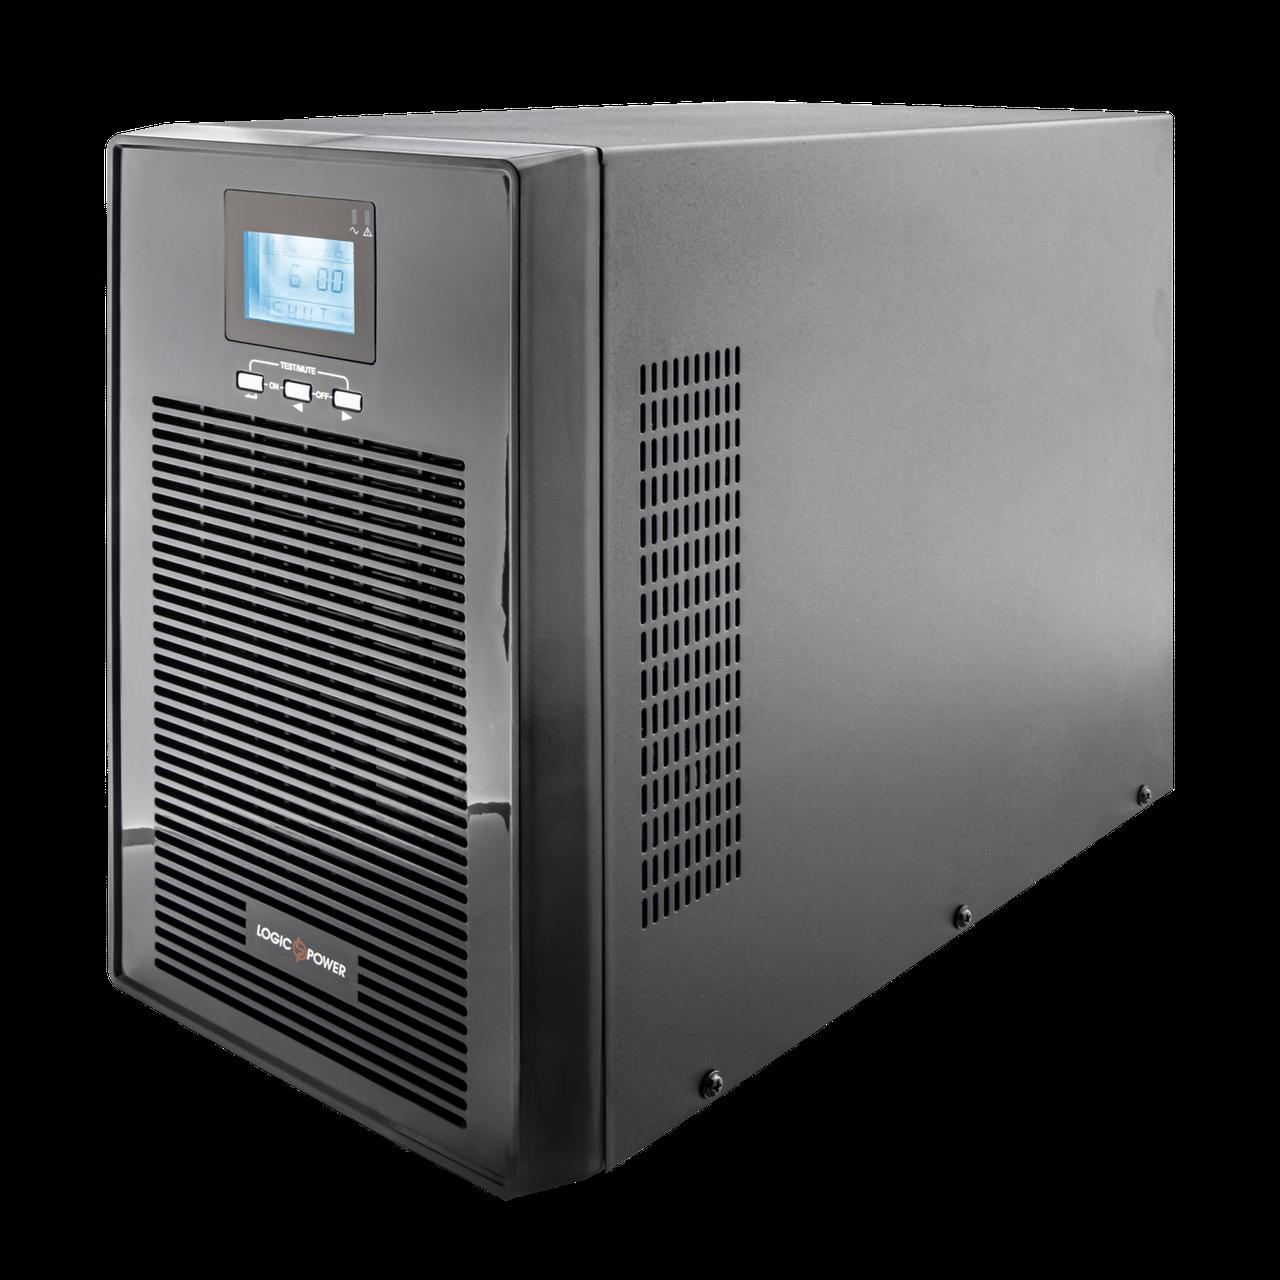 ИБП (UPS) Smart LogicPower-3000 PRO (батареи в комплекте)